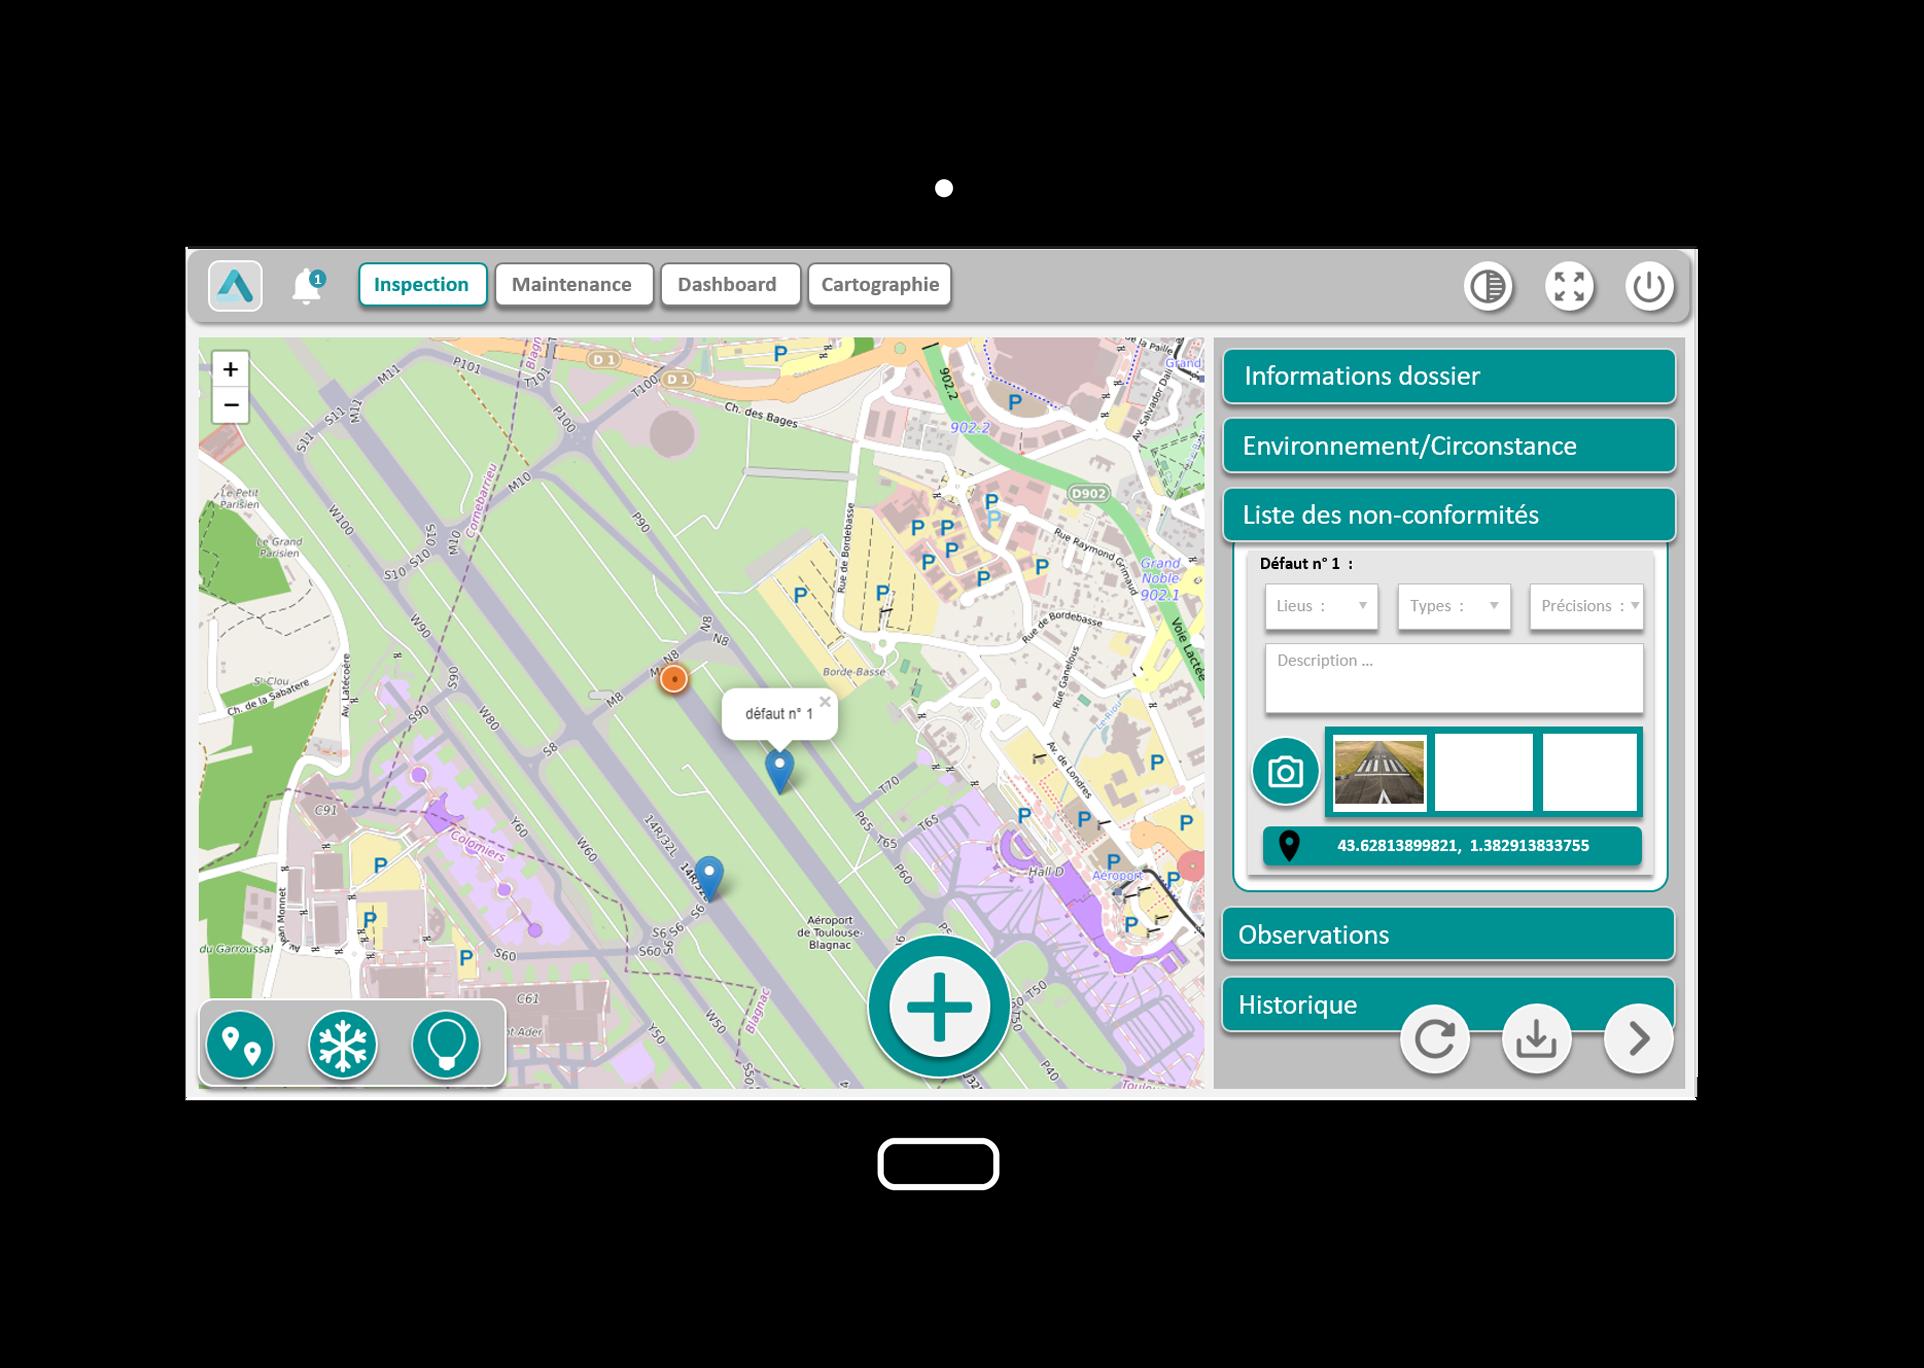 TrackSign-digital-form-runway-inspection-safety.PNG